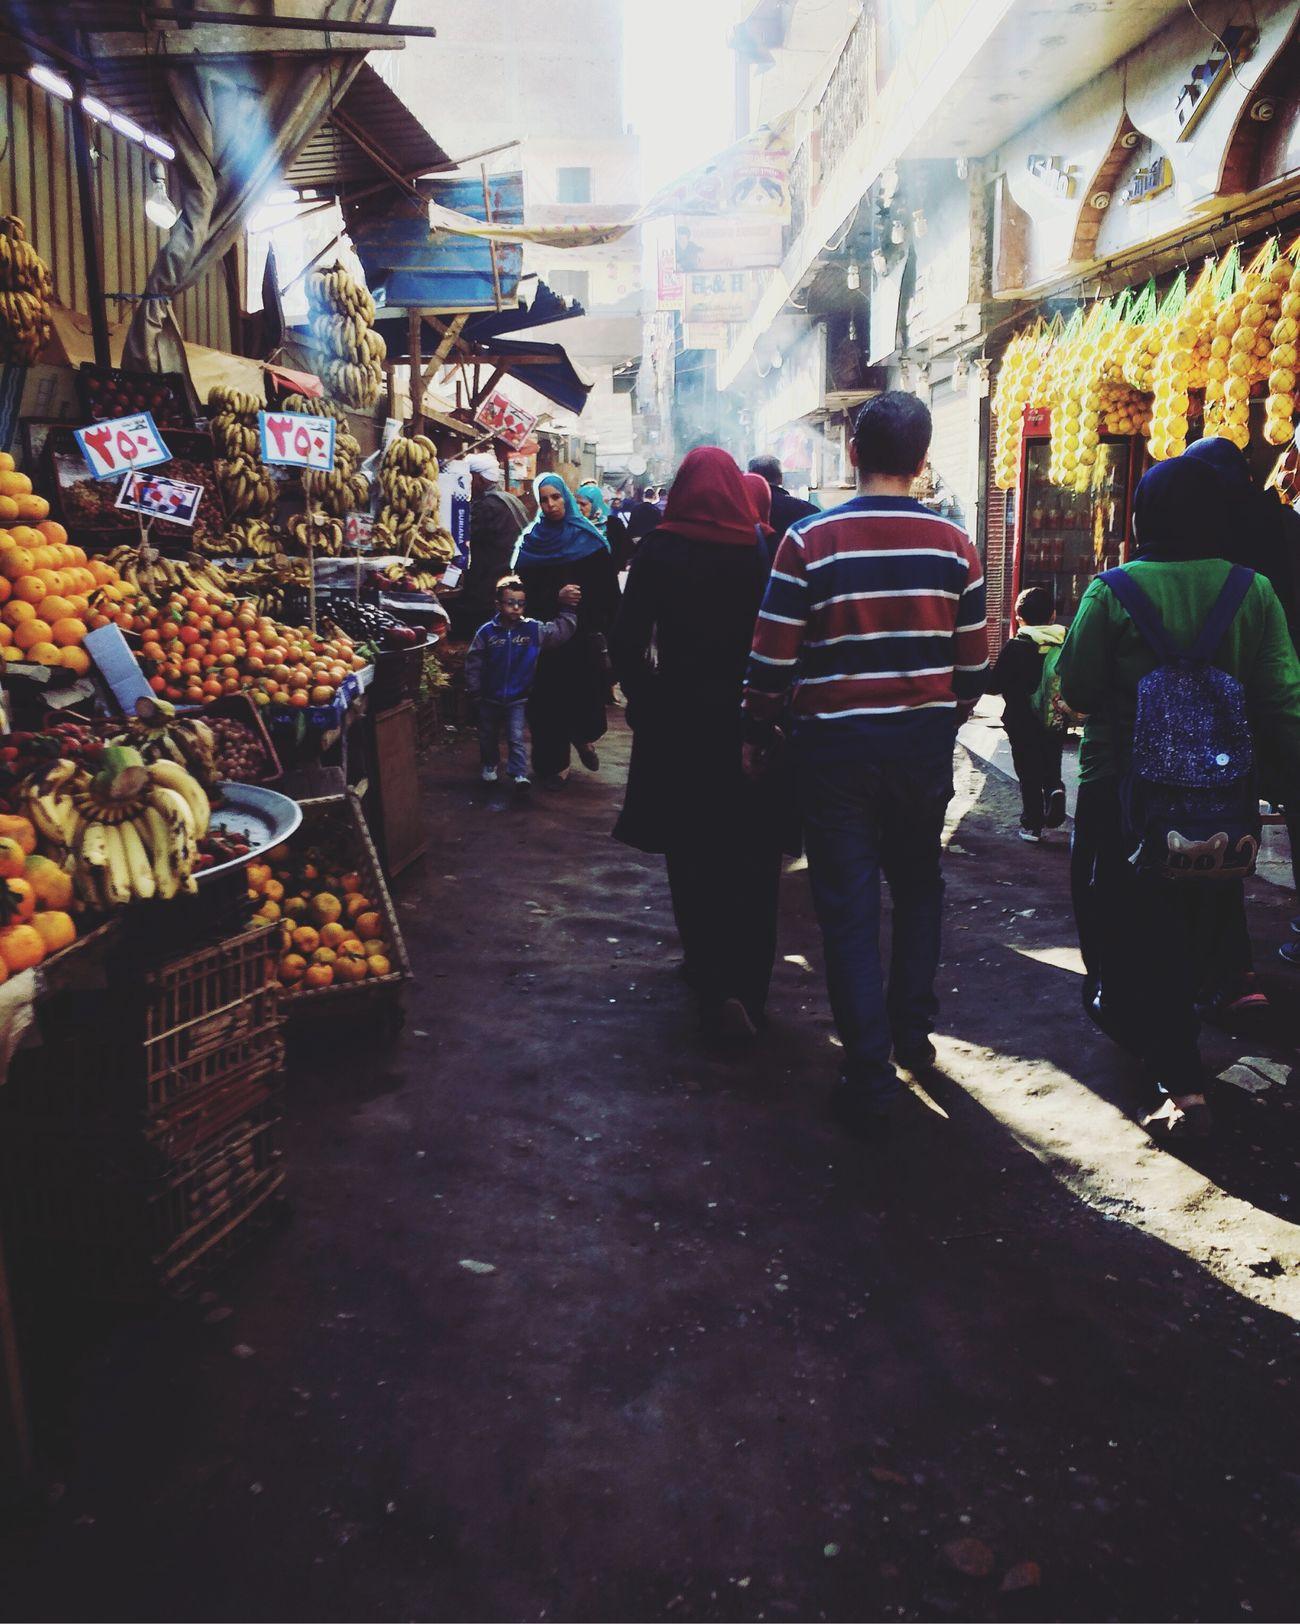 Egypt First Eyeem Photo Fruits Pepole EyeEm Vscocam Vscogood VSCO Poorpeople Street Children EyeEm Best Shots EyeEm Gallery Cairo Shoot Like Followme Snapseed Orange Banana